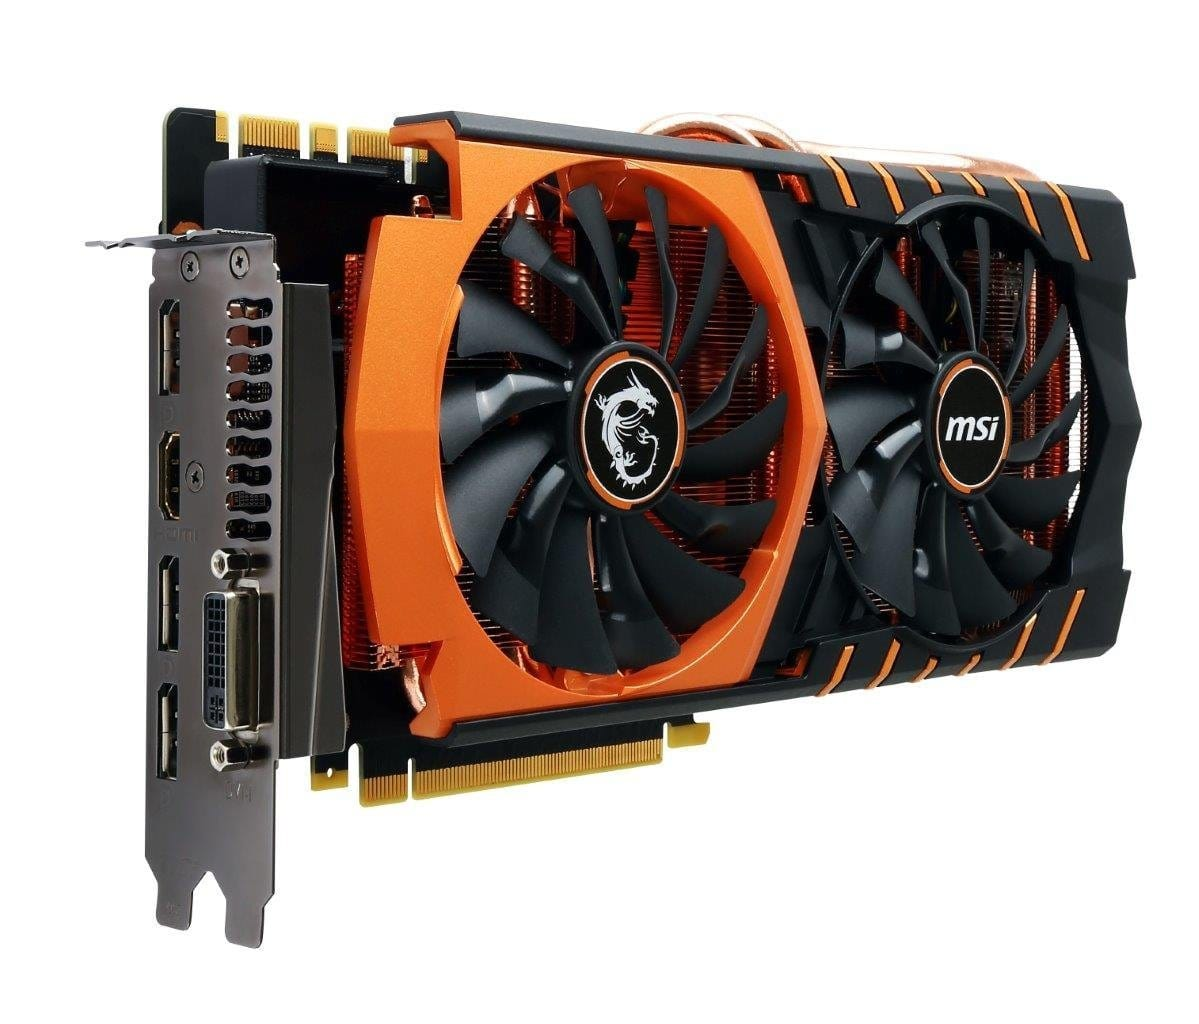 MSI GeForce GTX 980TI GAMING 6G GOLDEN EDITION $399 or $369 AR